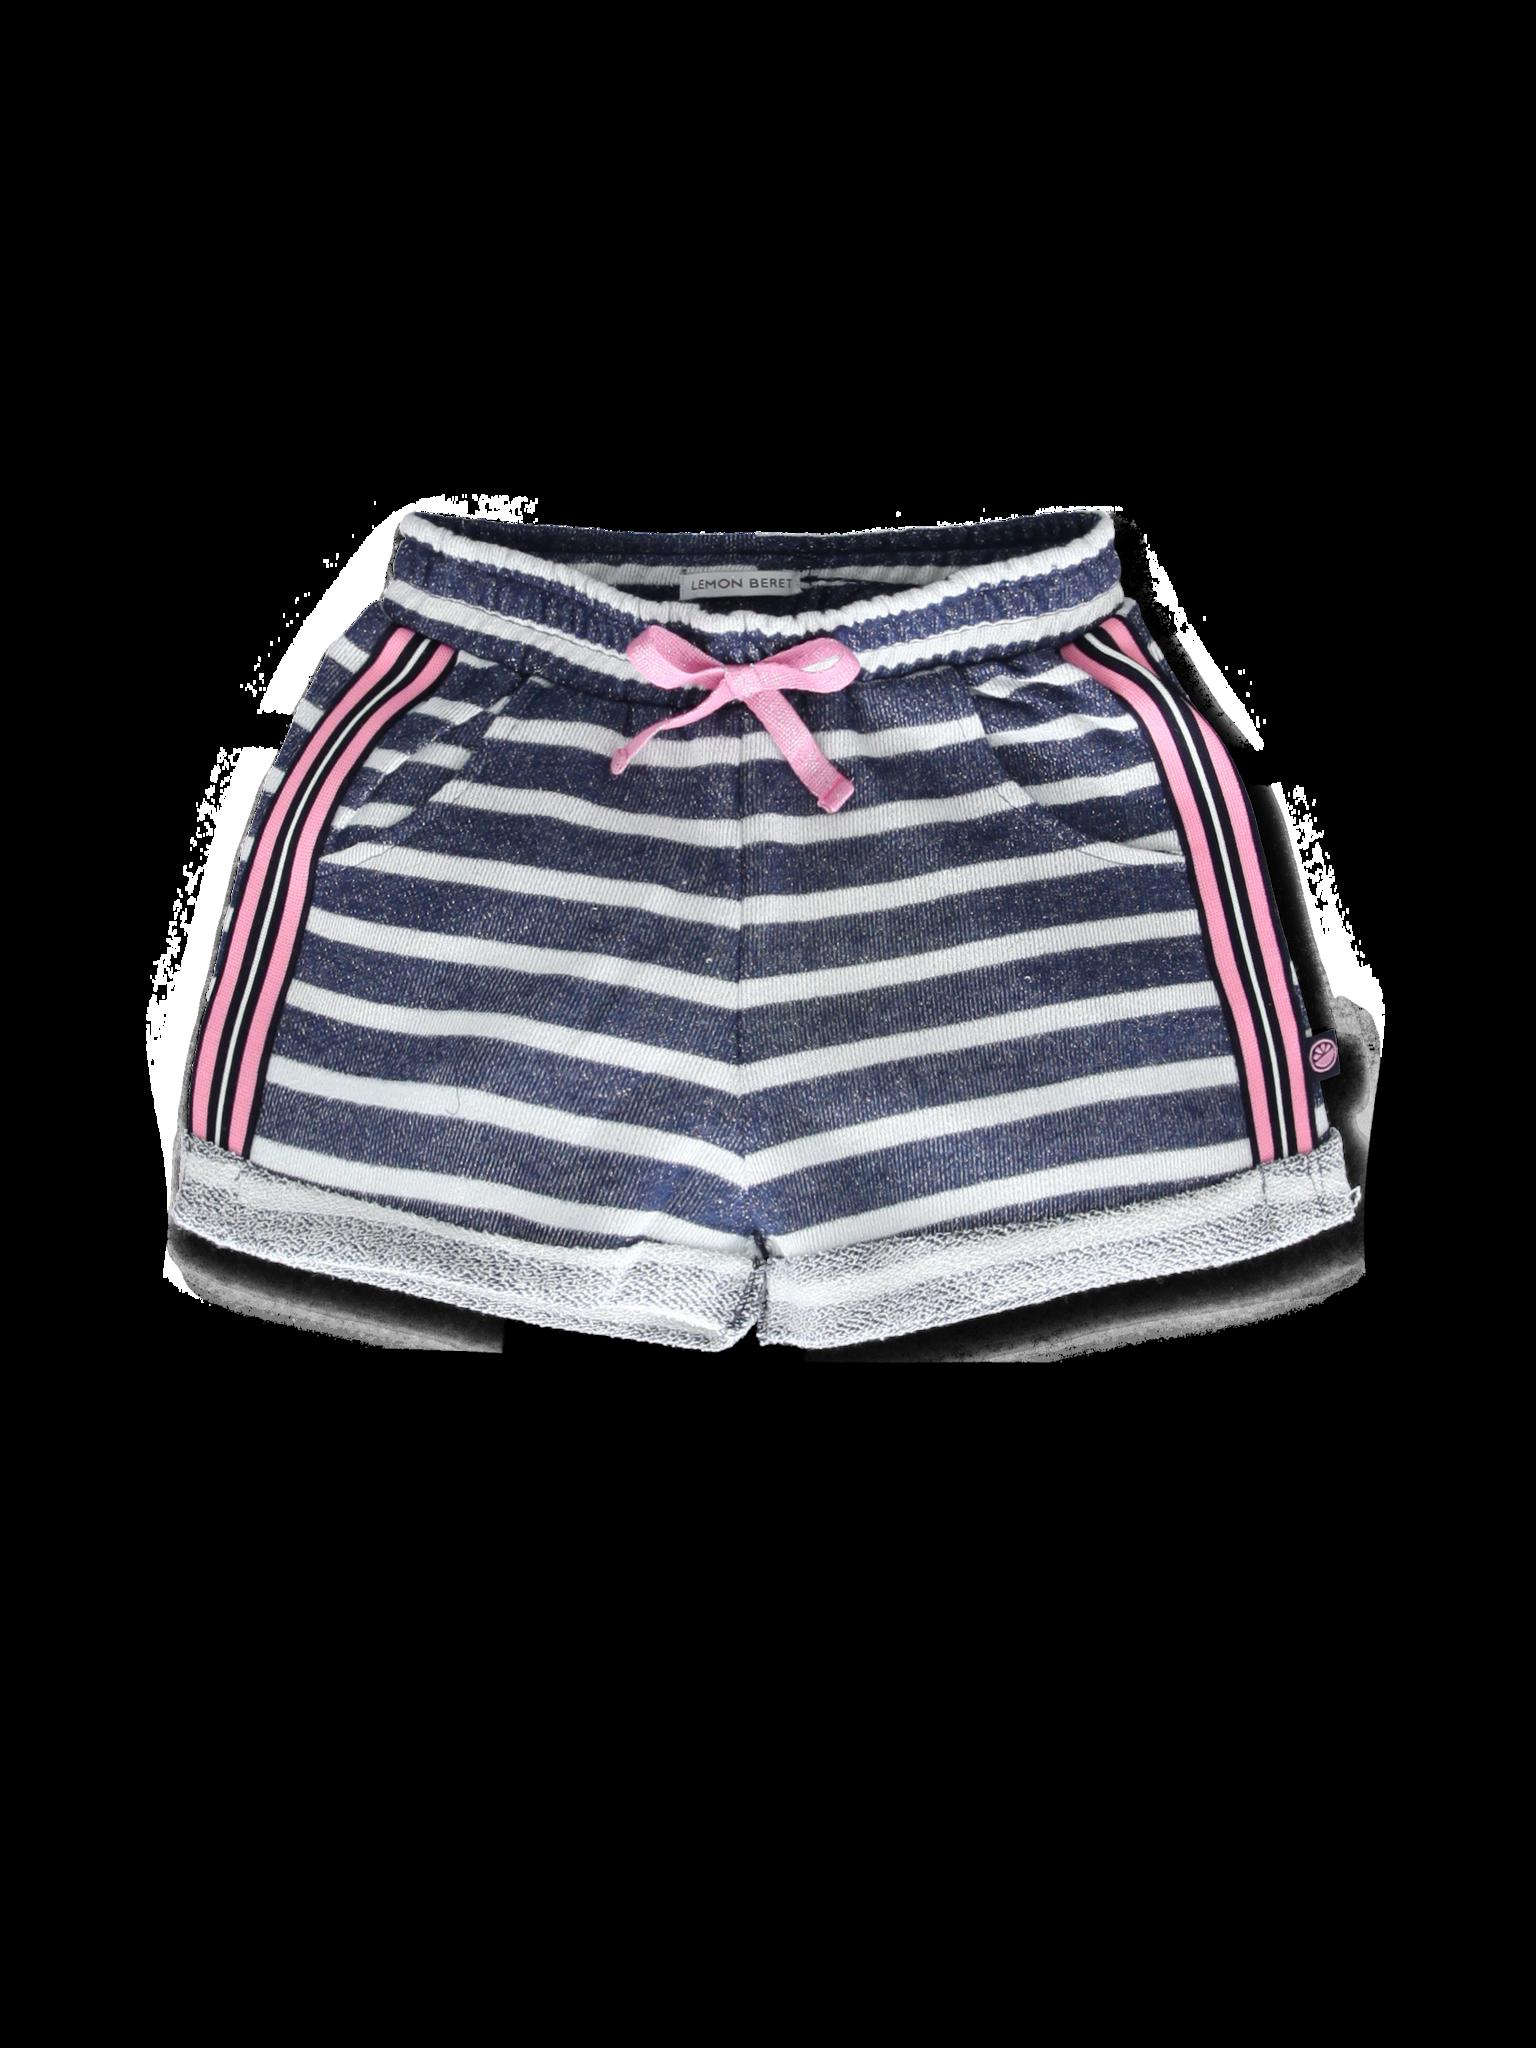 Lemon Beret | Summer 2020 Small Girls | Shorts | 12 pcs/box